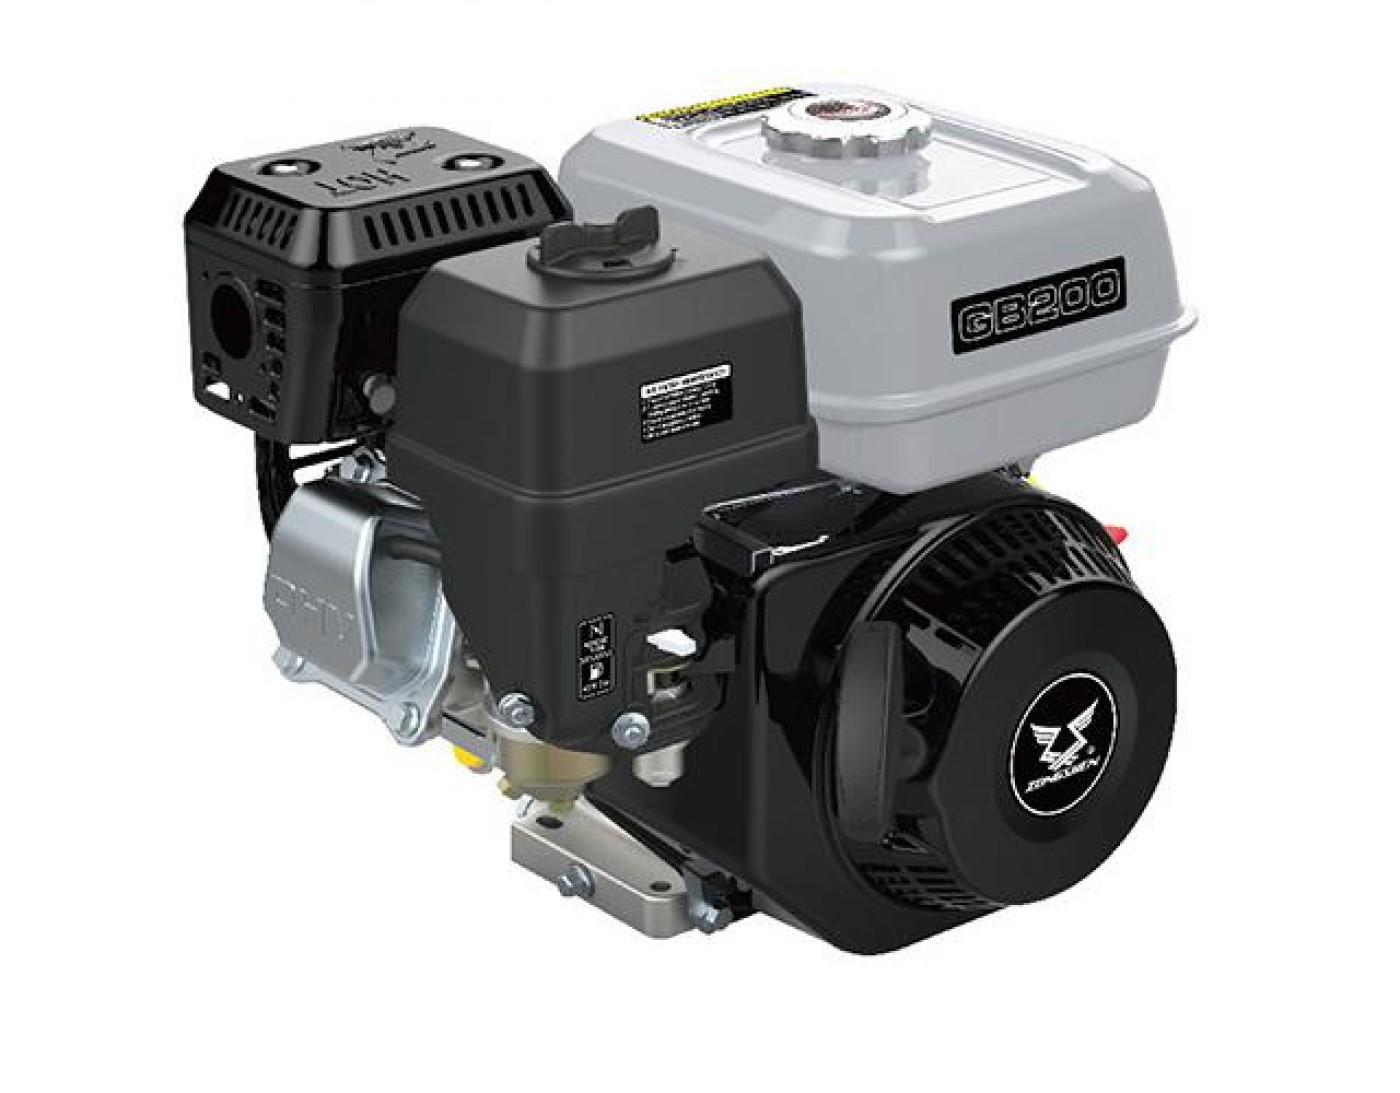 Motor ZONGSHEN GB200 196cc 6,5 HŘÍDEL 19mm